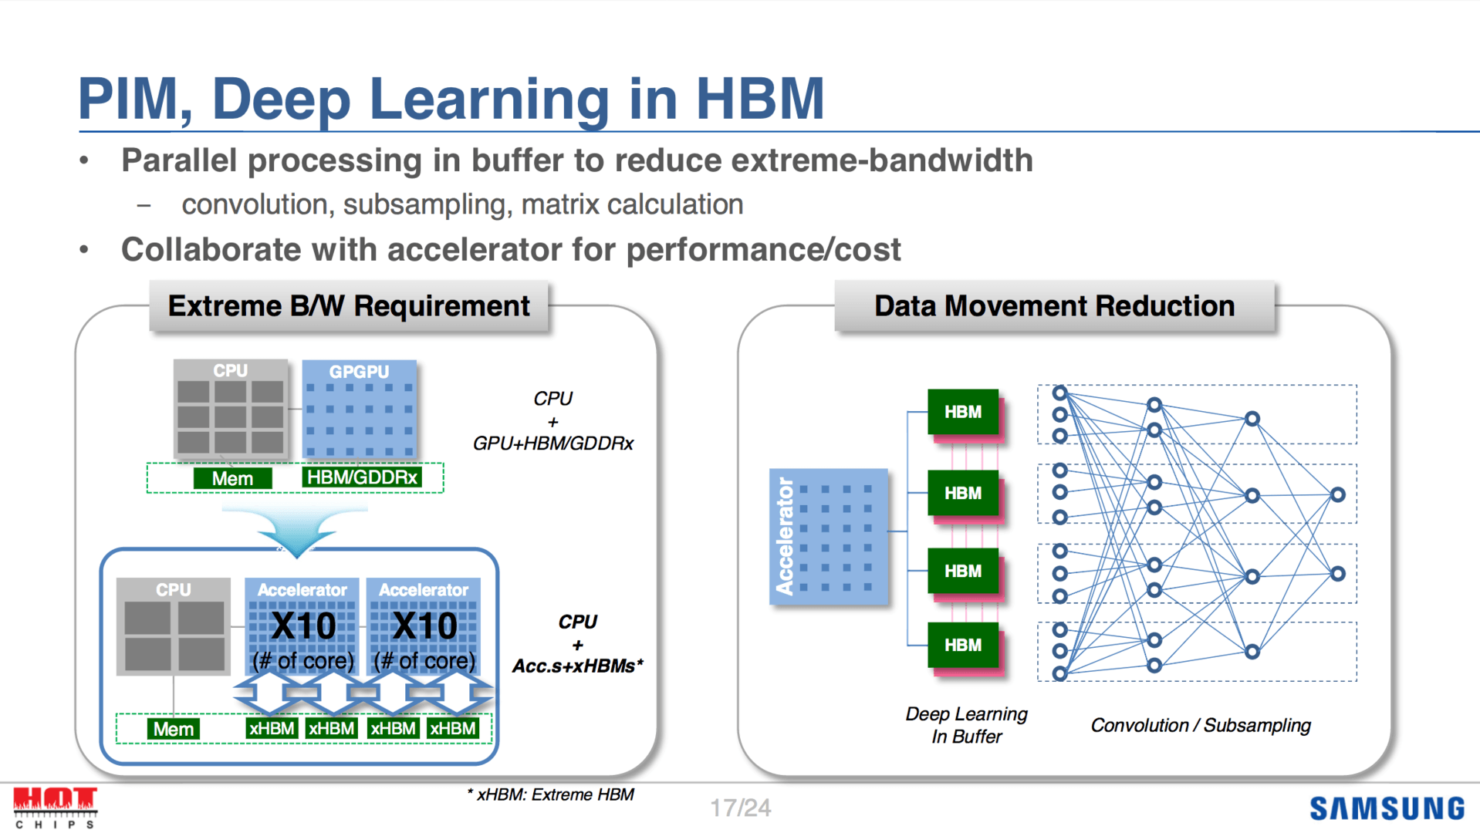 samsung-deep-learning-hbm